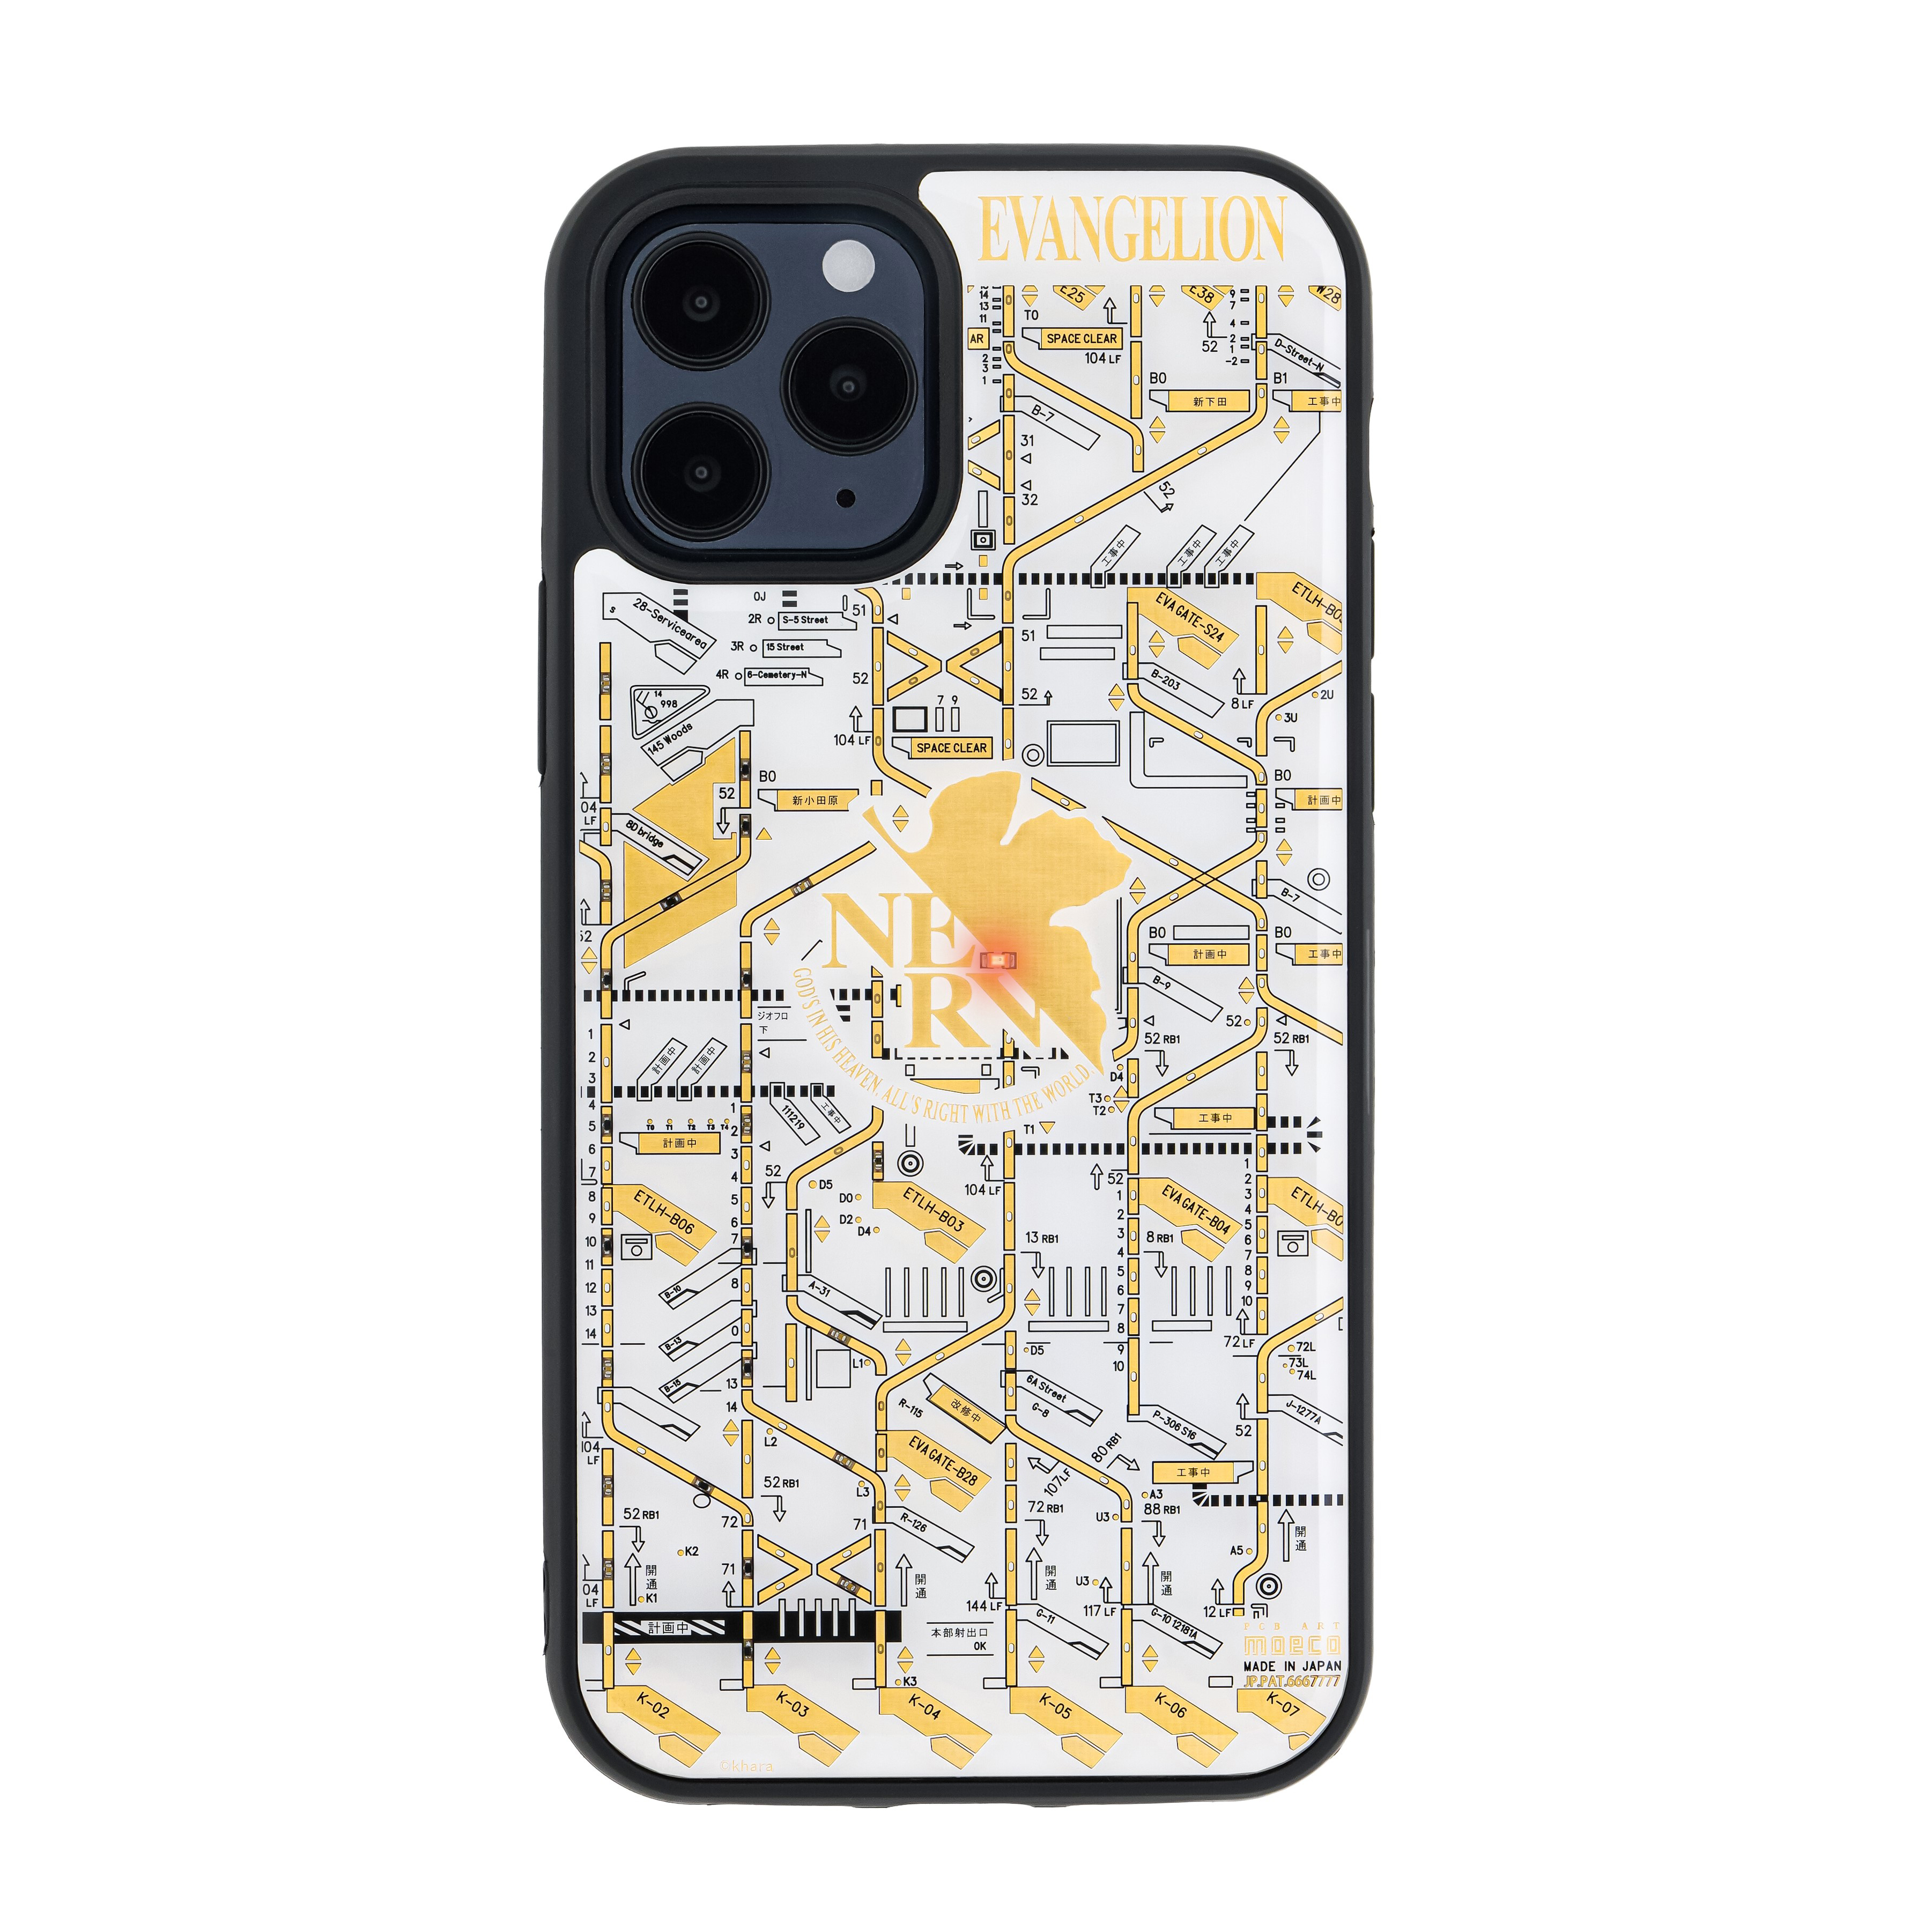 FLASH NERV 基板アート iPhone 12 / 12 Pro ケース 白【東京回路線図A5クリアファイルをプレゼント】